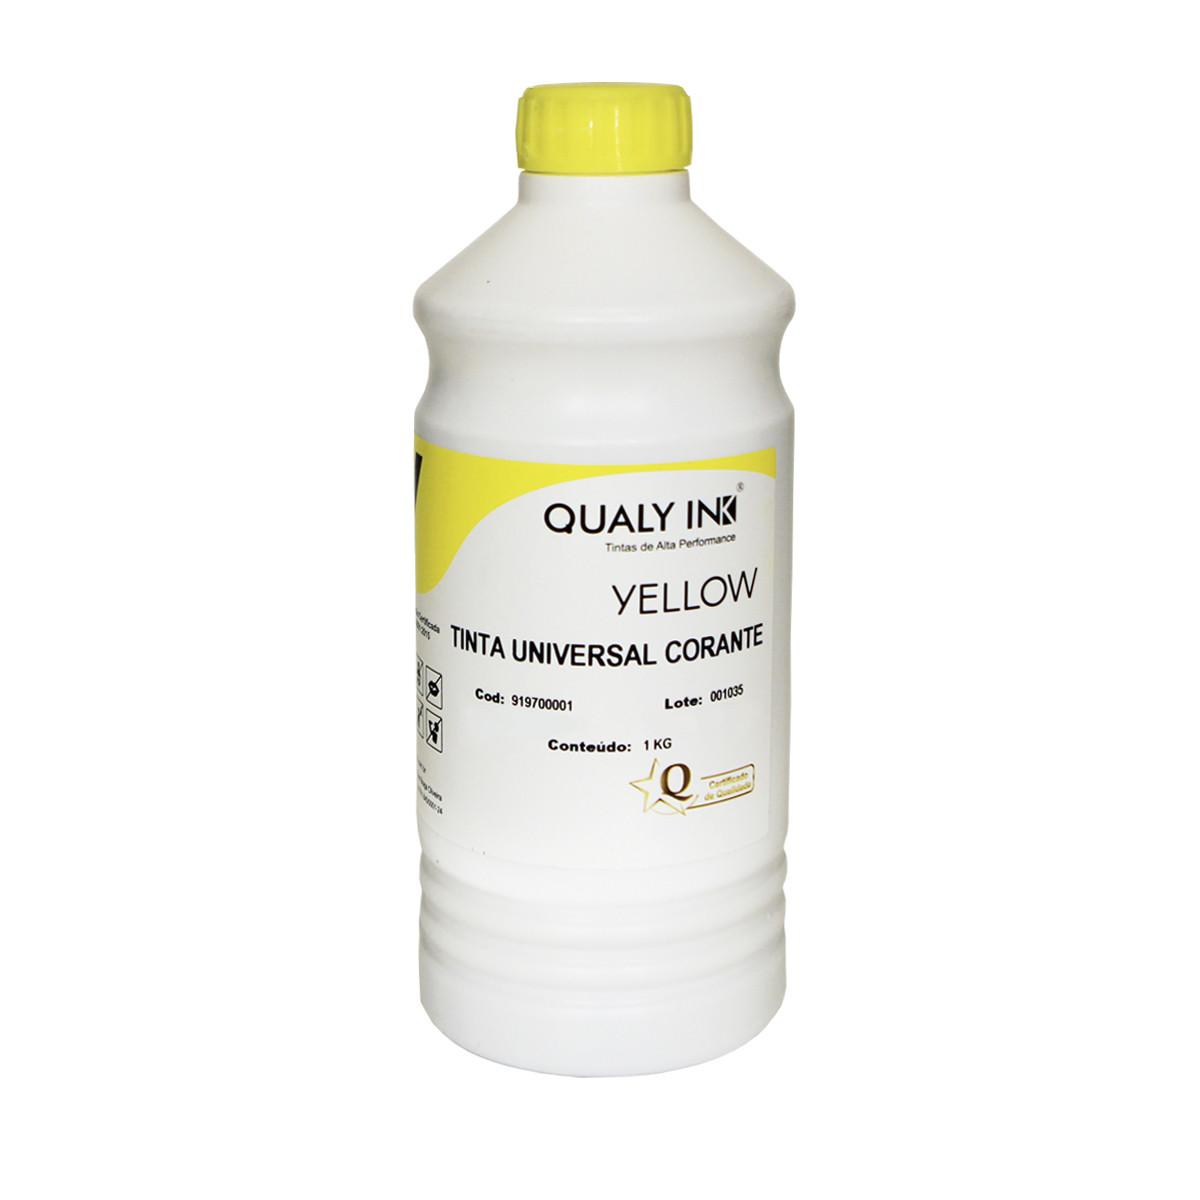 Tinta Canon Universal Amarelo Corante 919700001   Qualy Ink 1kg